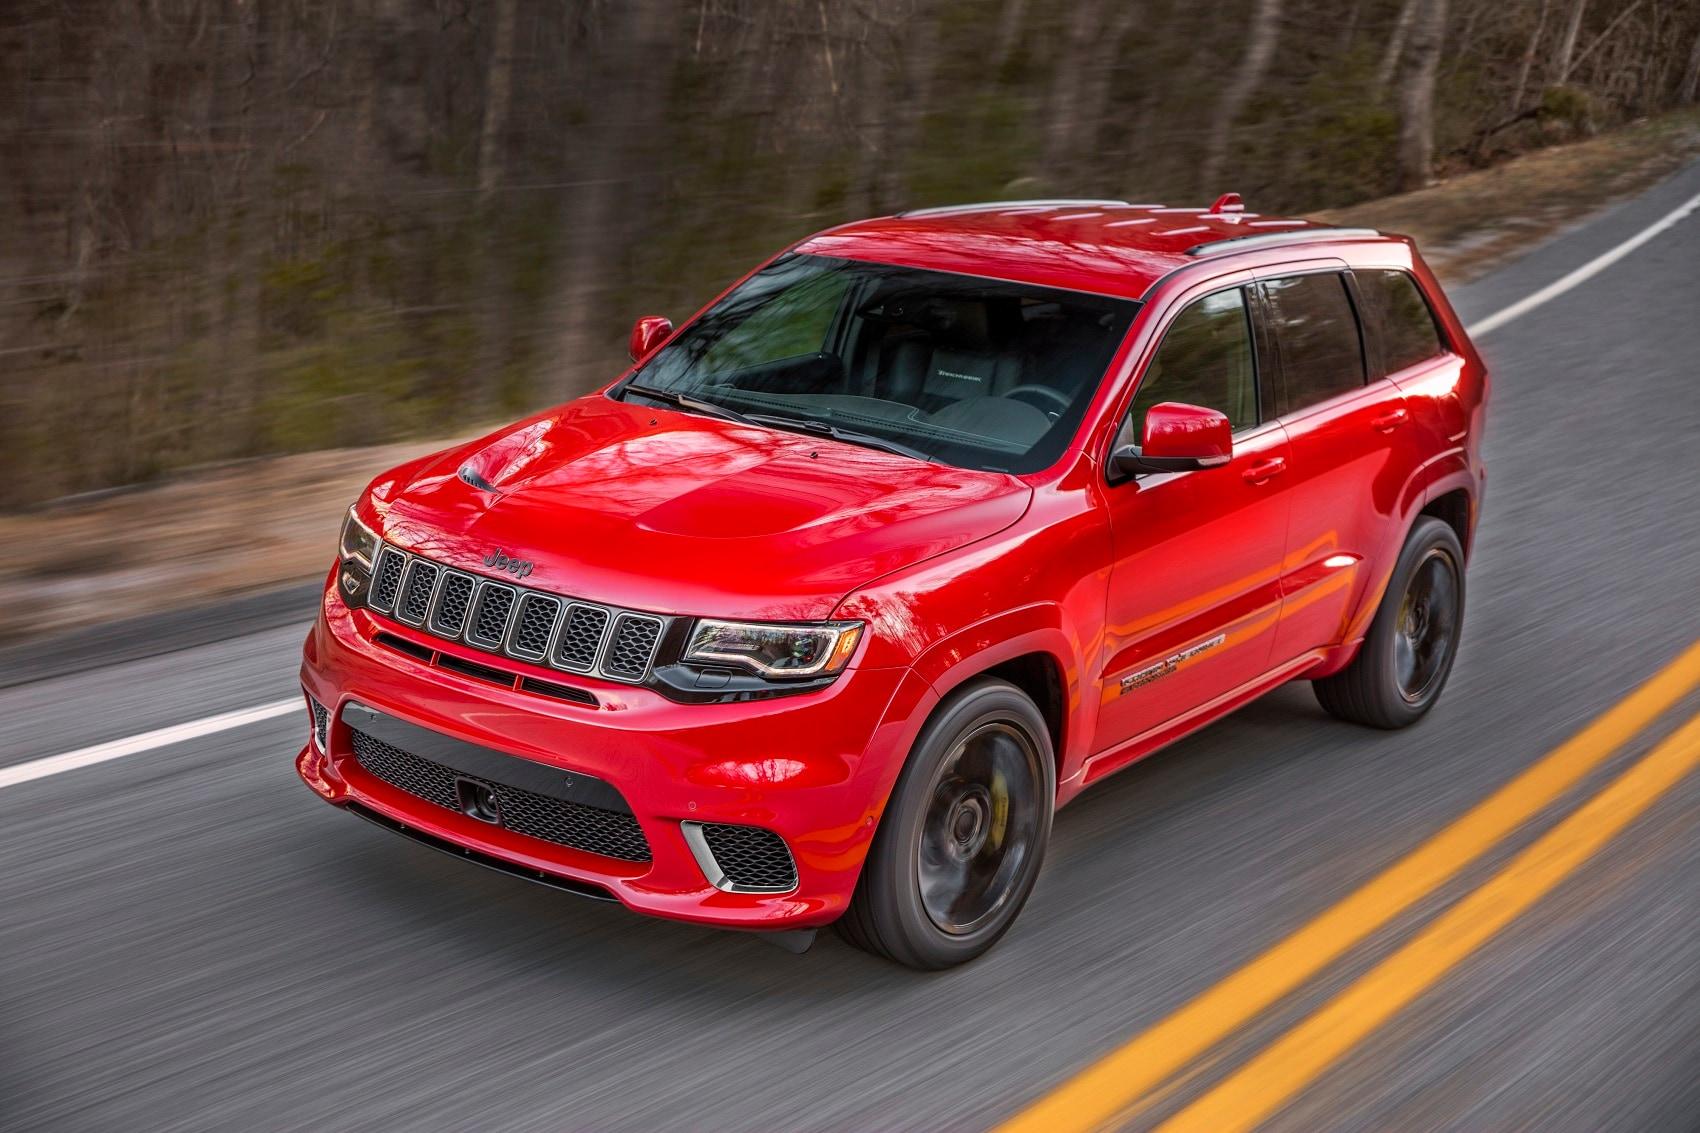 Jeep Grand Cherokee Cumming GA | Troncalli CDJR